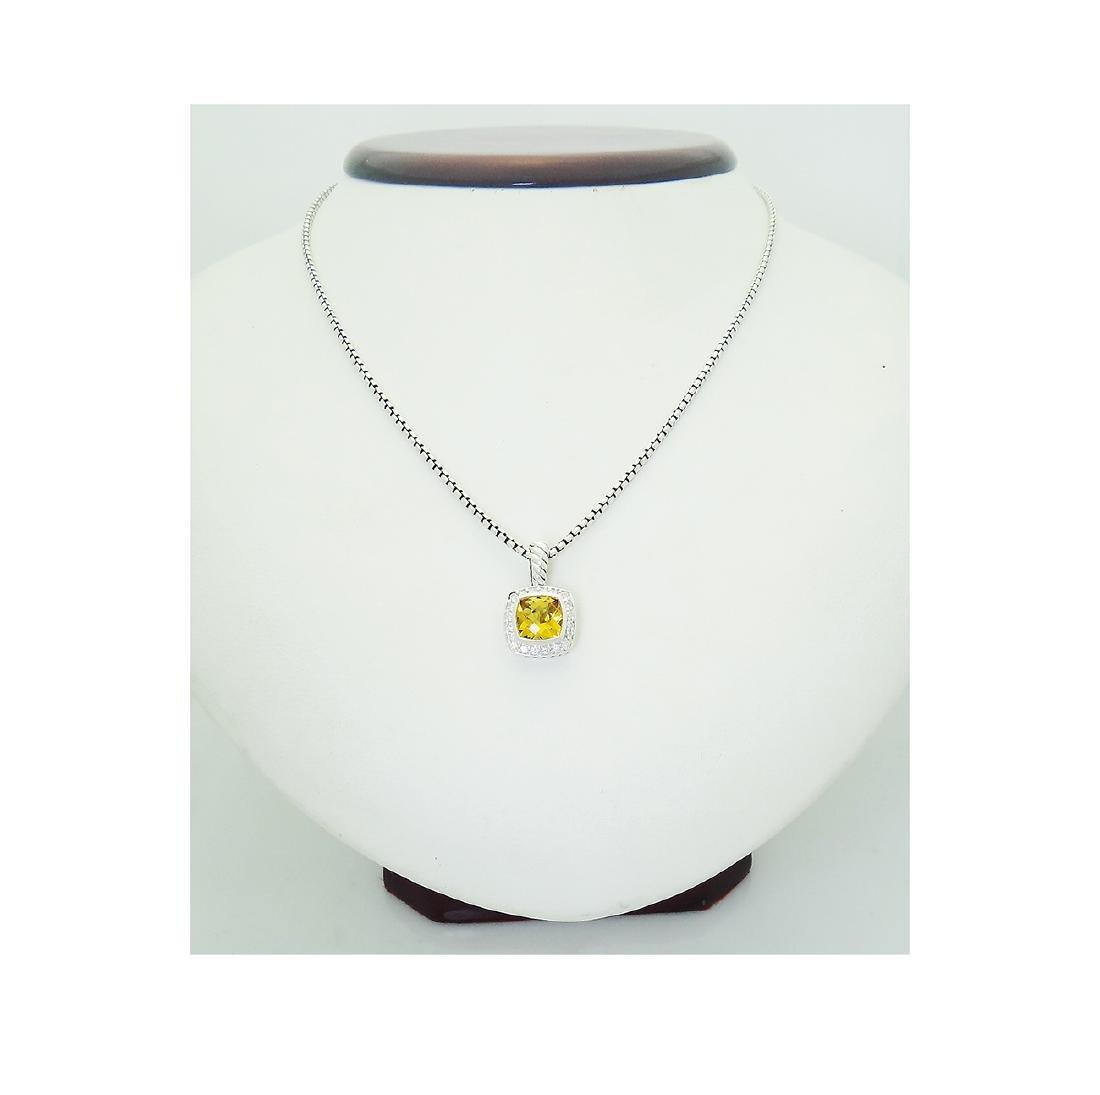 David Yurman 925 Sterling Silver Lemon Citrine Diamond